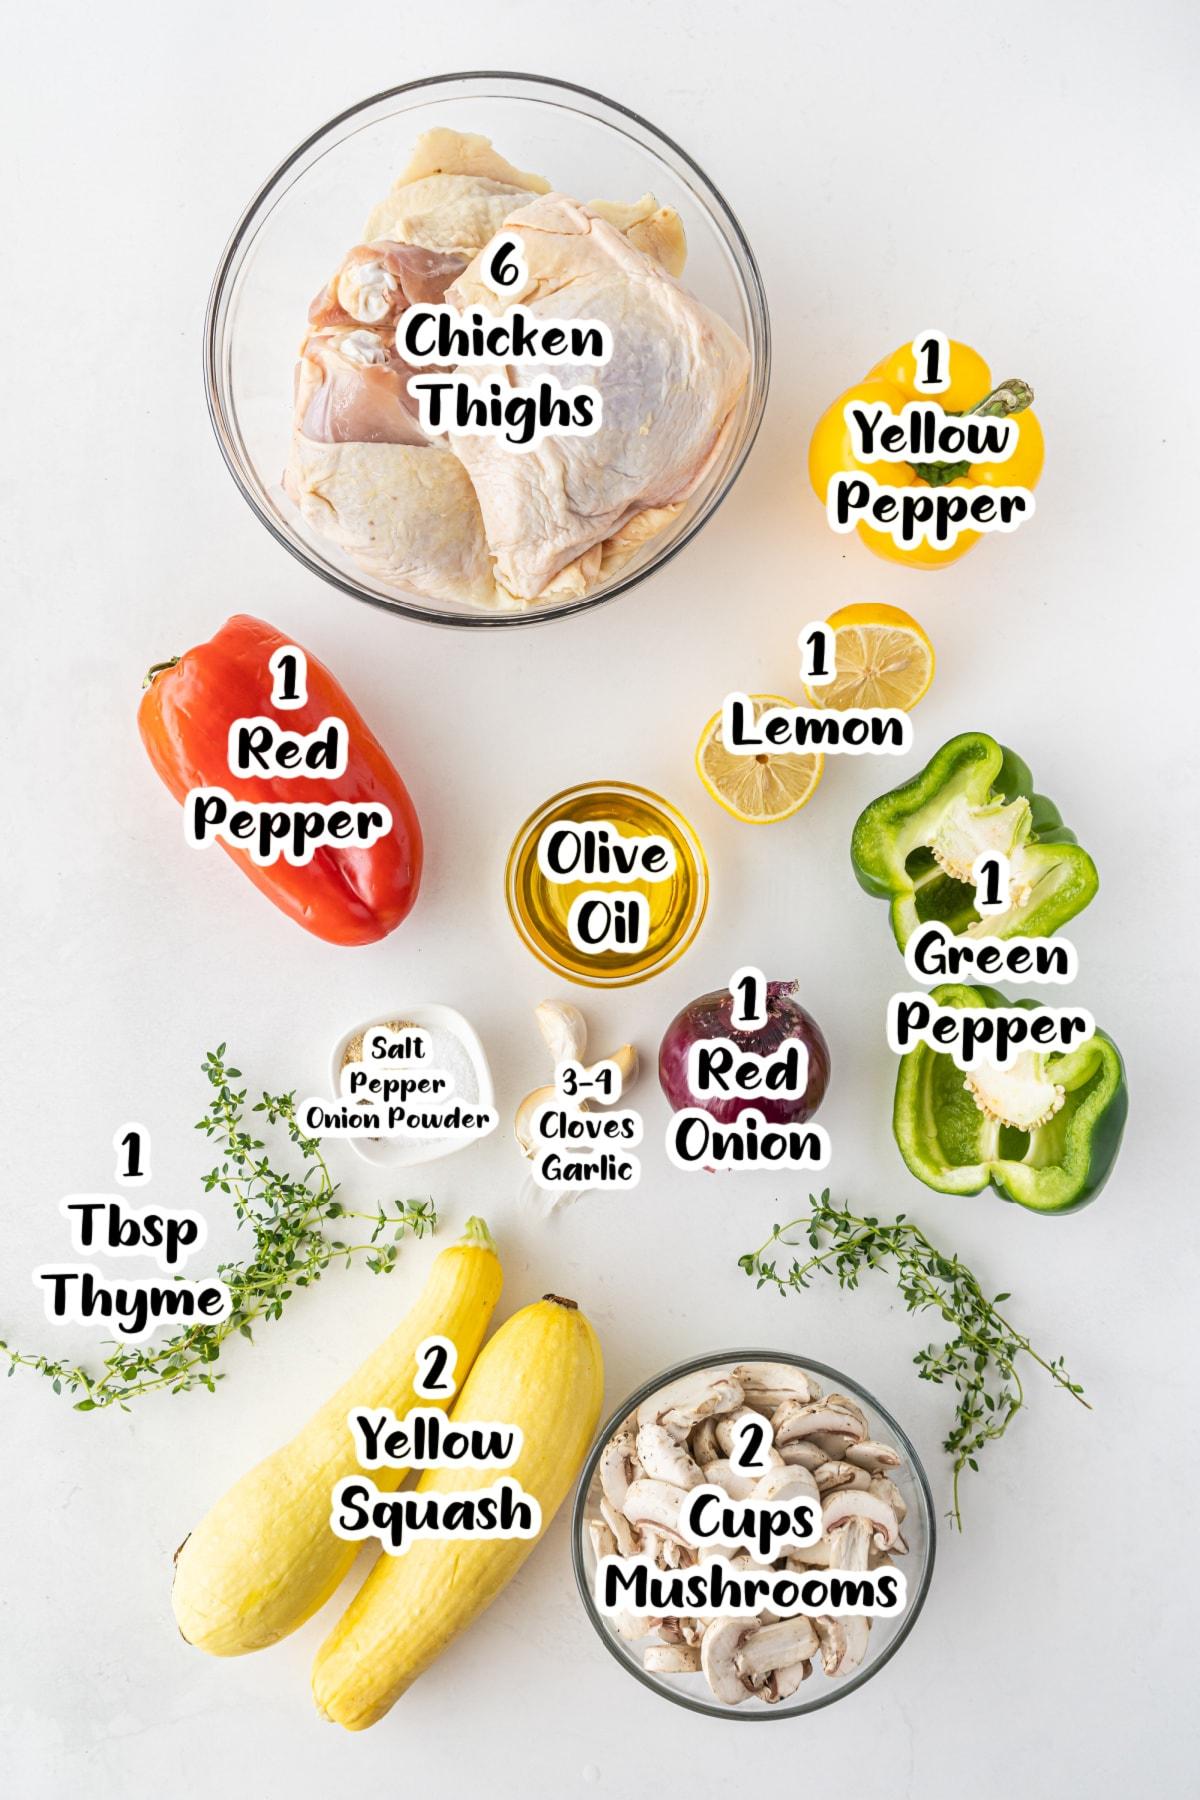 Ingredients for sheet pan chicken and veggies